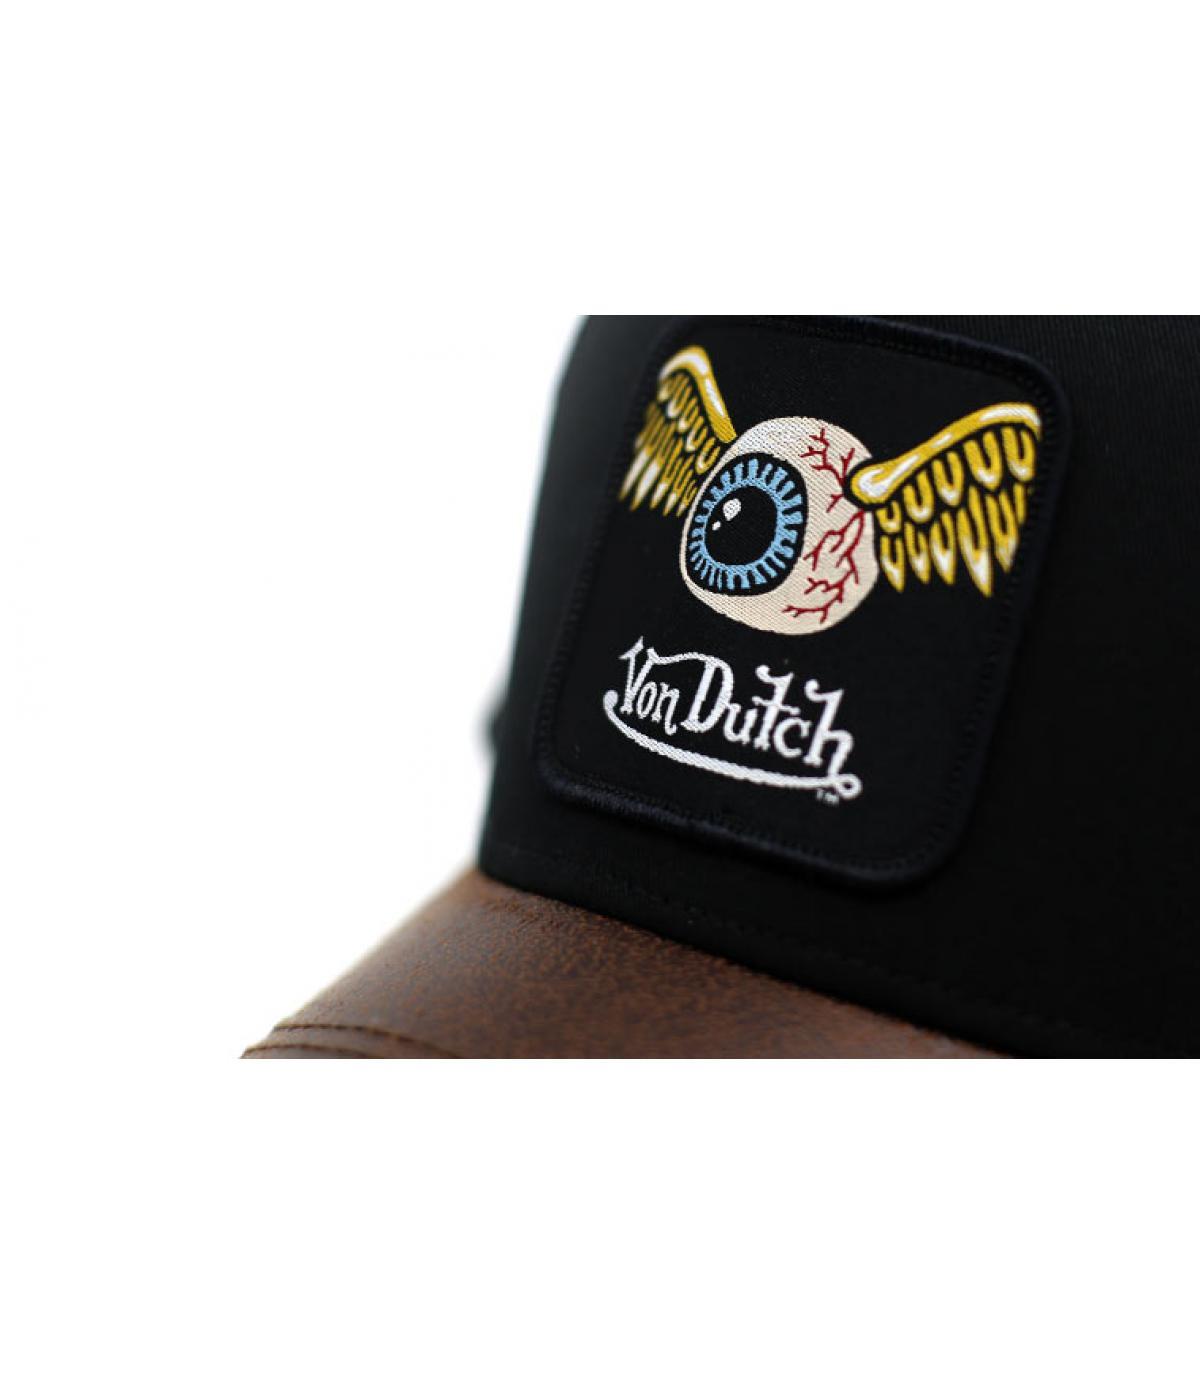 Détails Trucker Eye Patch black brown - image 3